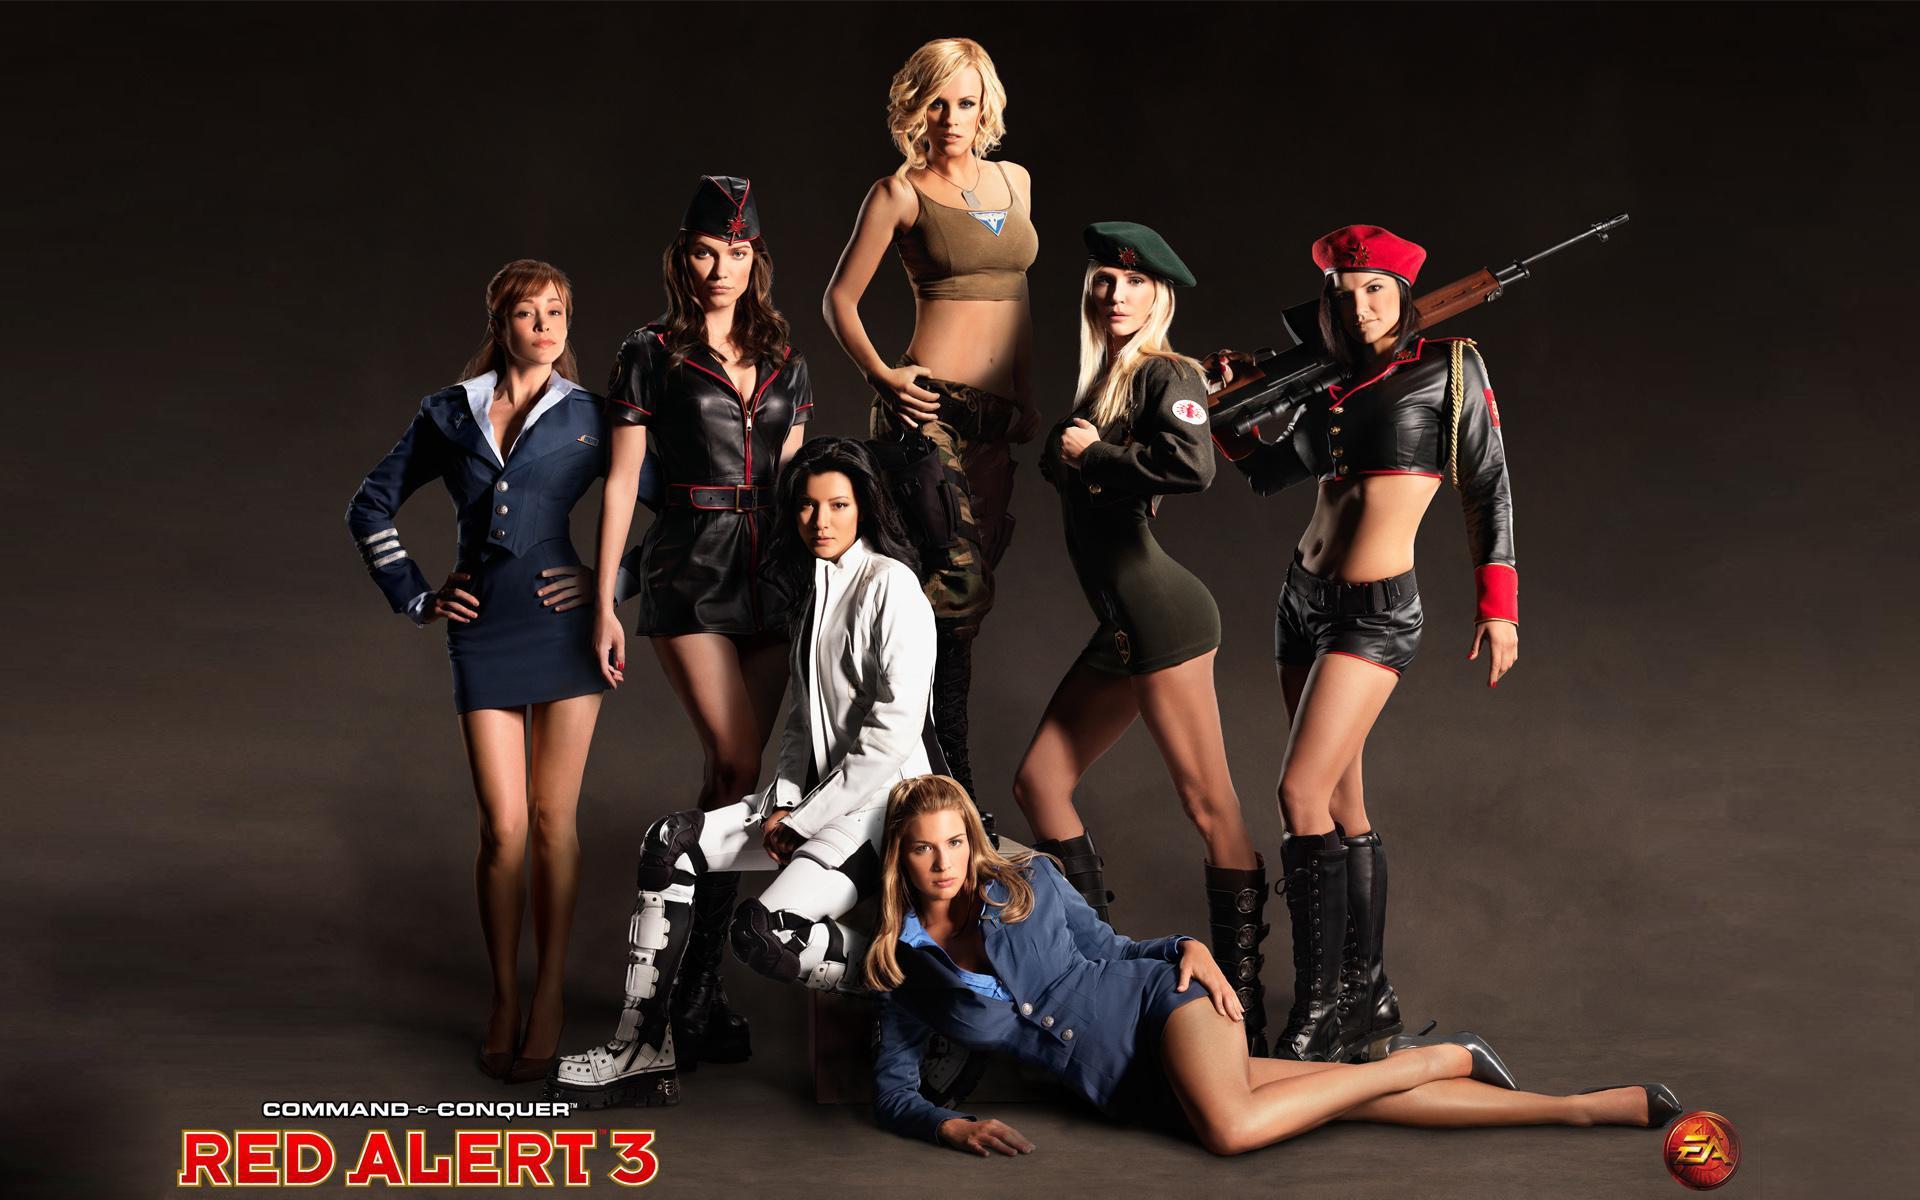 fc_redalert3_girls